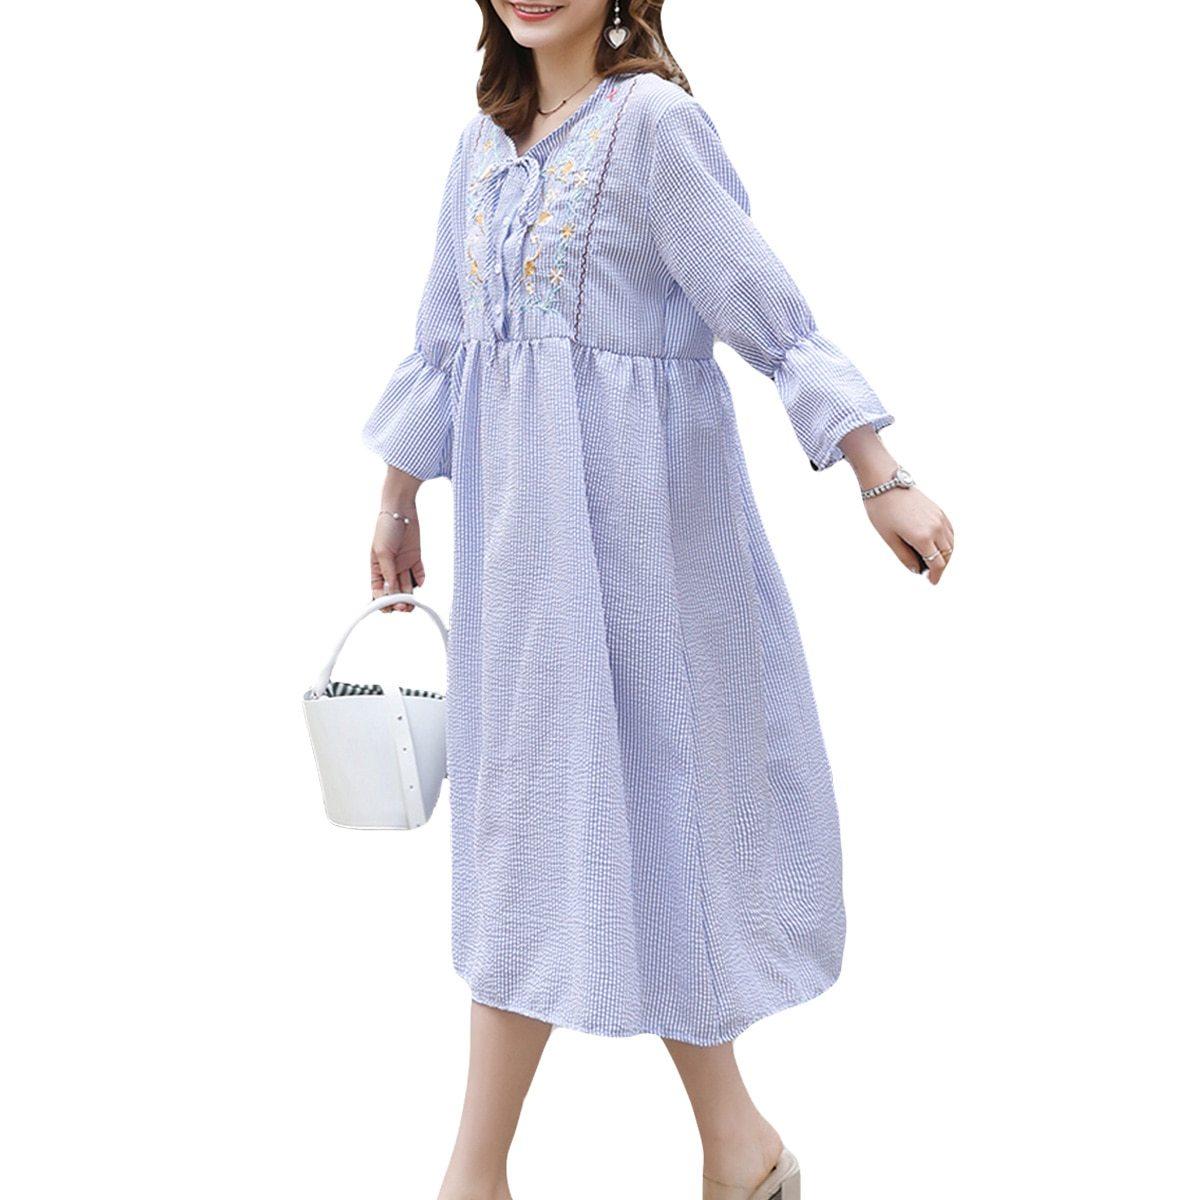 Maternity's Dress Fashion Long Sleeve Embroidery Pattern Loose Dress